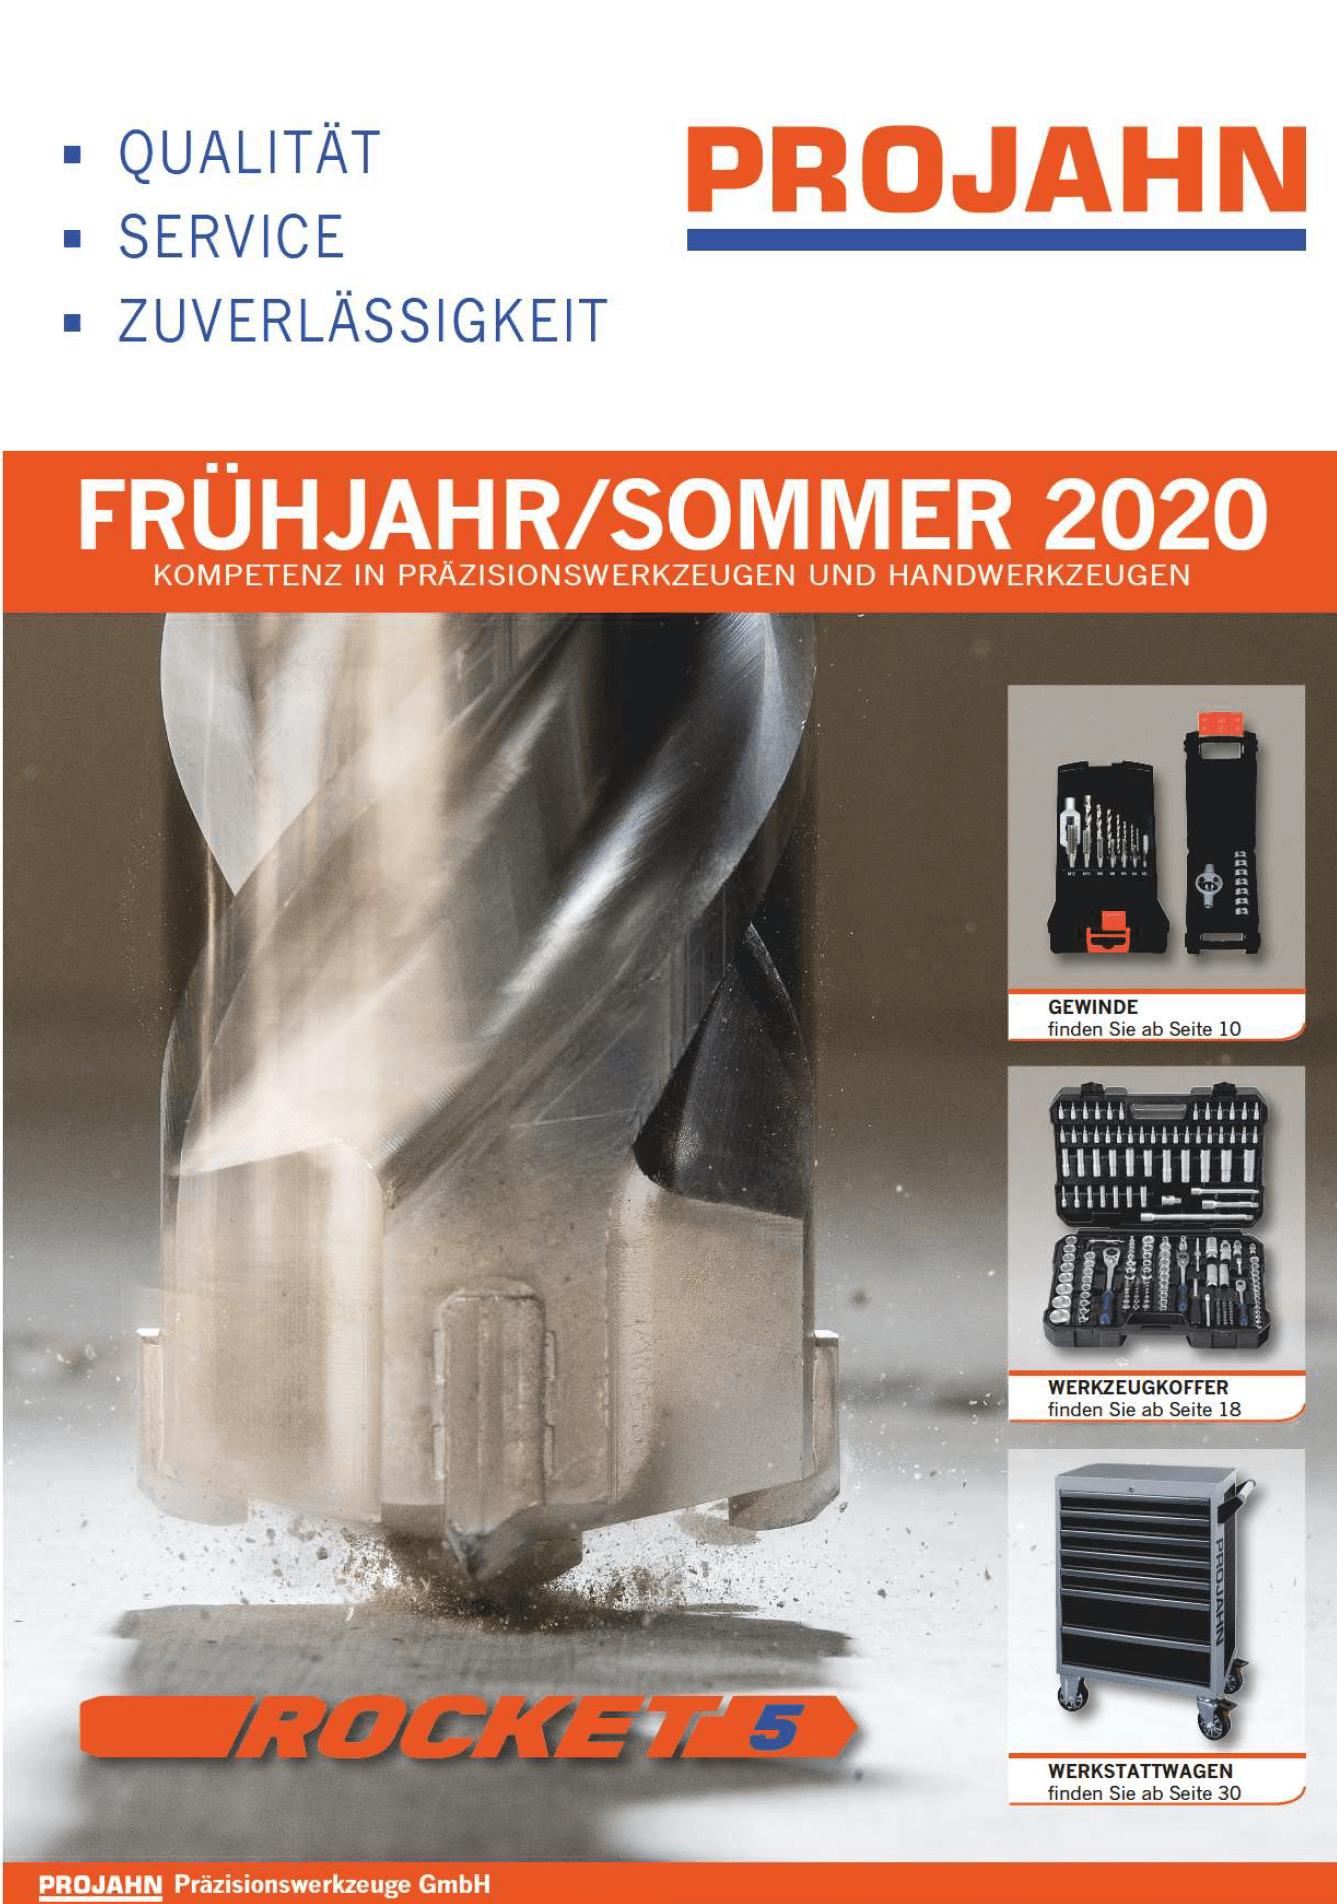 PROJAHN - jar / leto - 2020